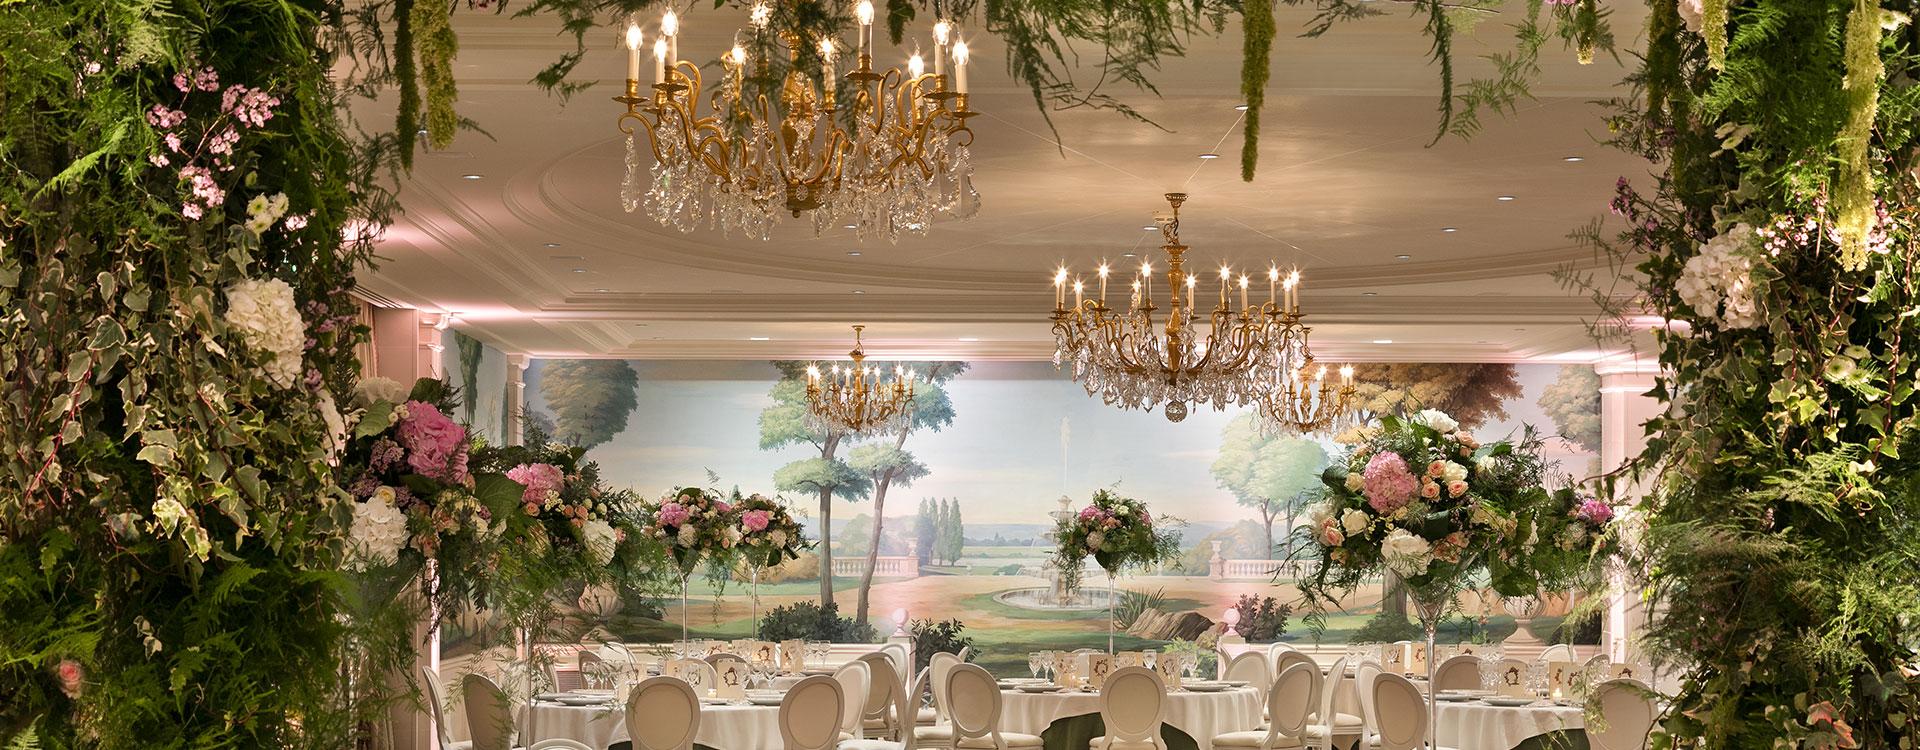 Meetings Luxury Event Venues In Paris Le Bristol